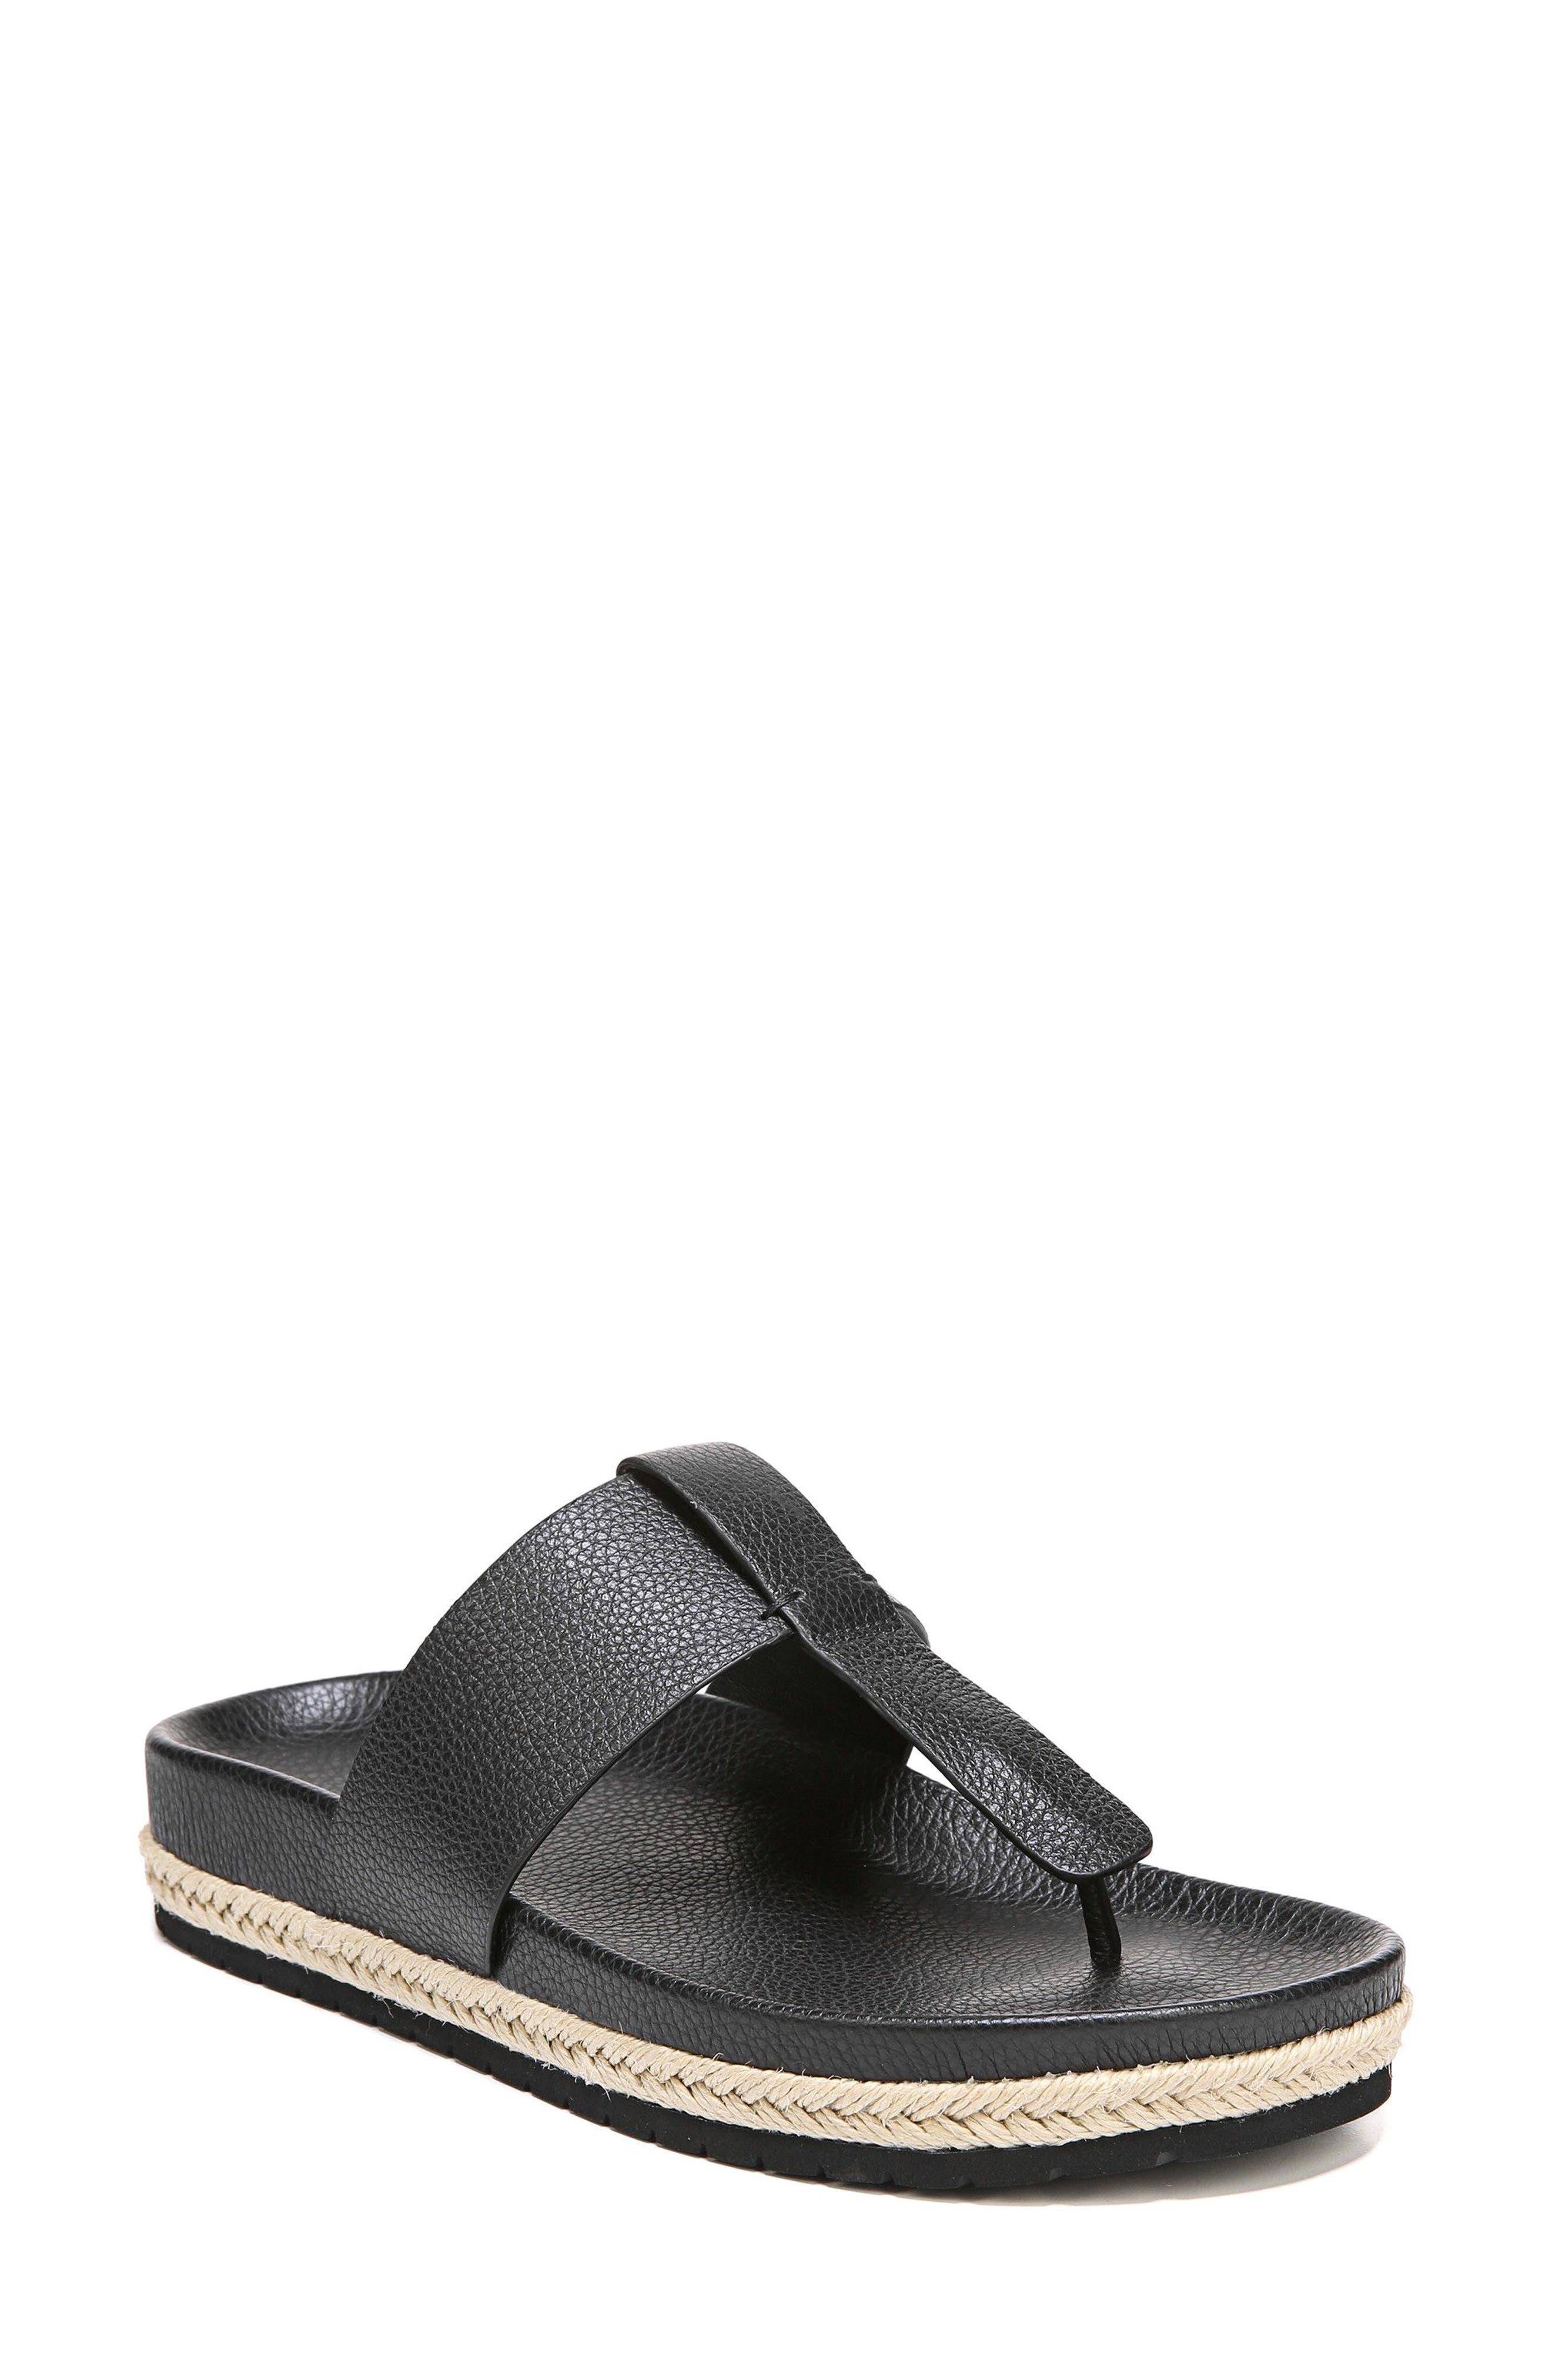 Alternate Image 1 Selected - Vince Avani T-Strap Flat Sandal (Women)